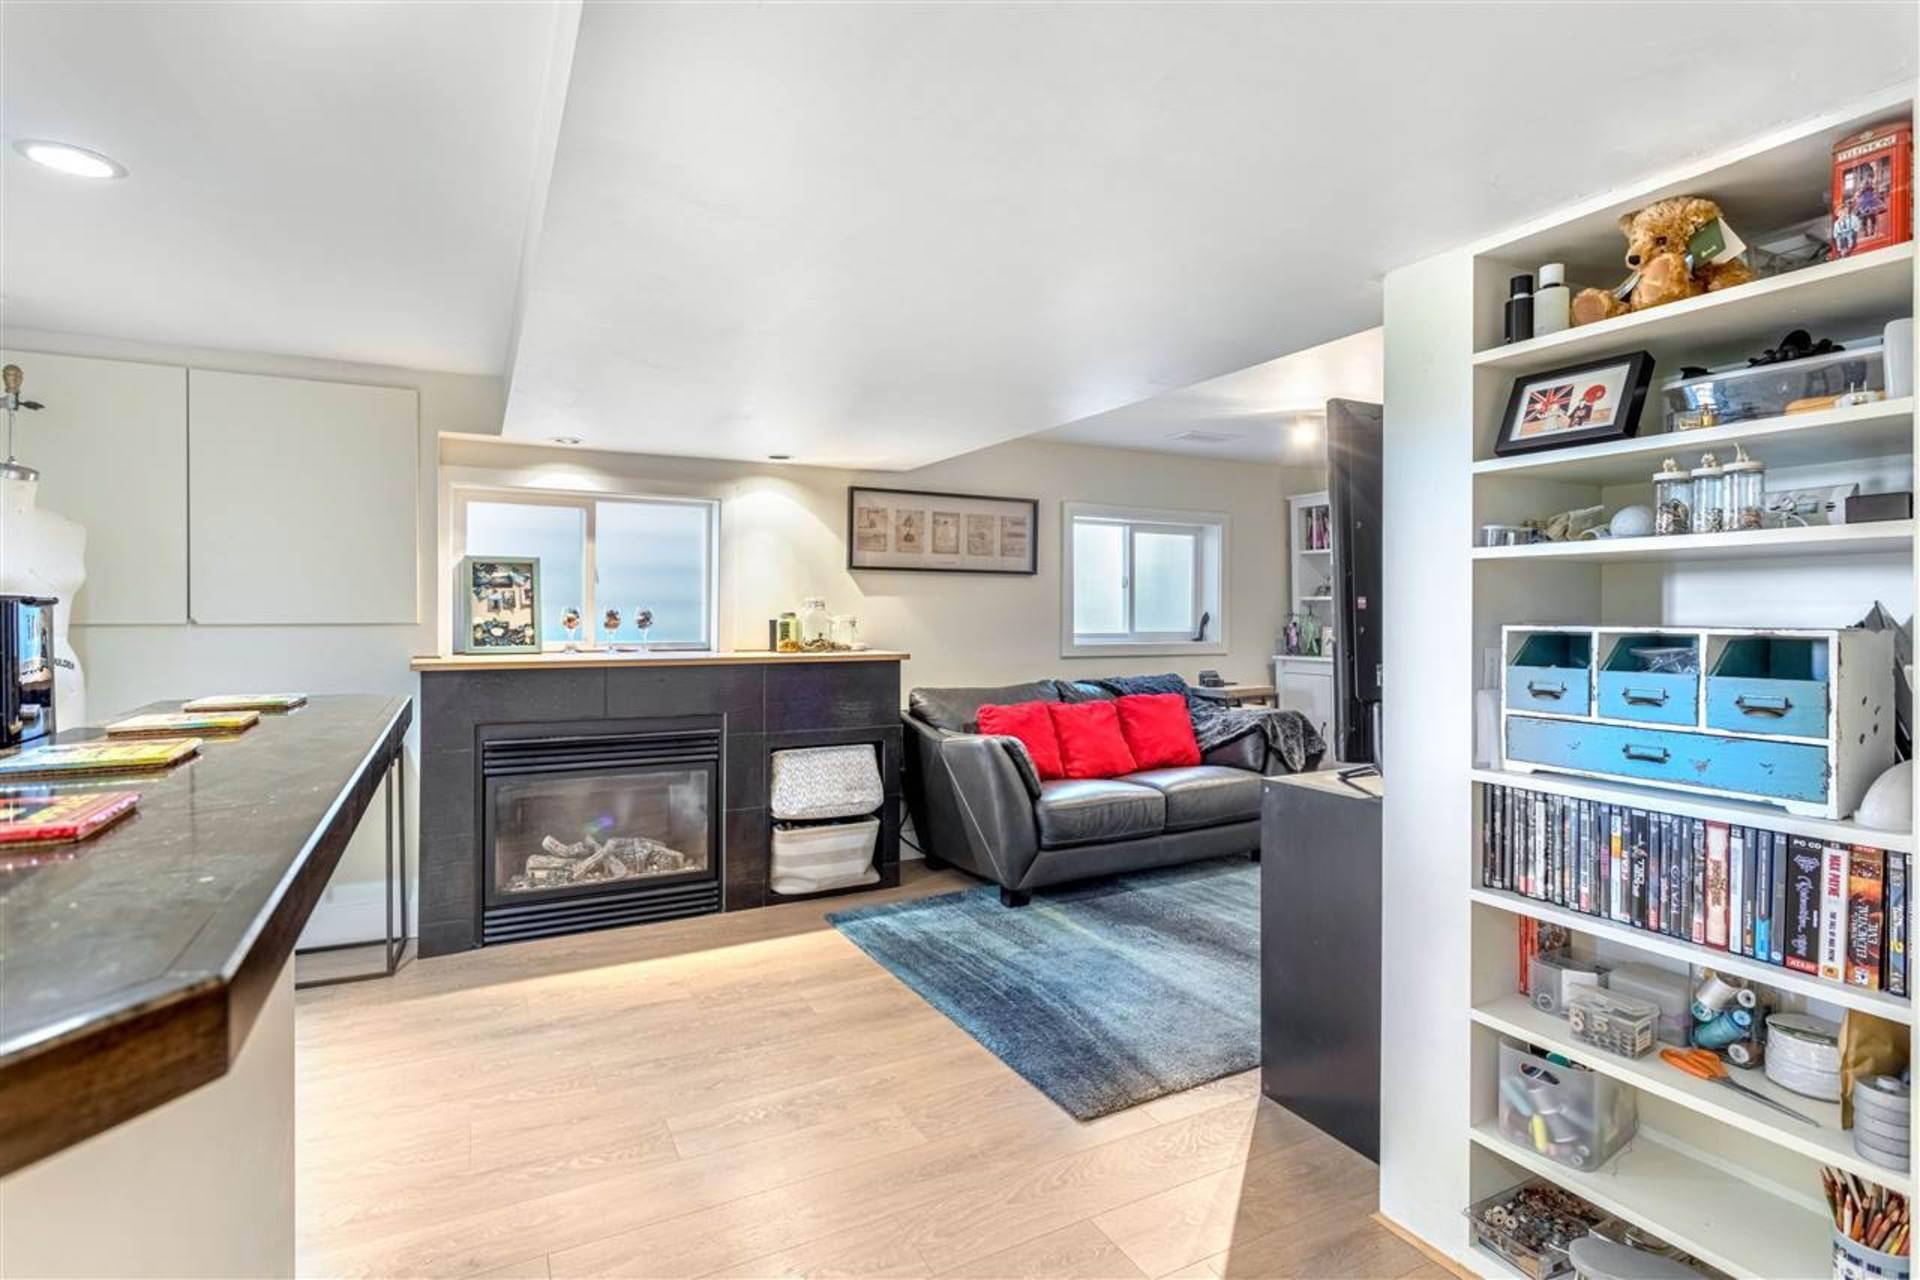 3912-parker-street-willingdon-heights-burnaby-north-15 at 3912 Parker Street, Willingdon Heights, Burnaby North